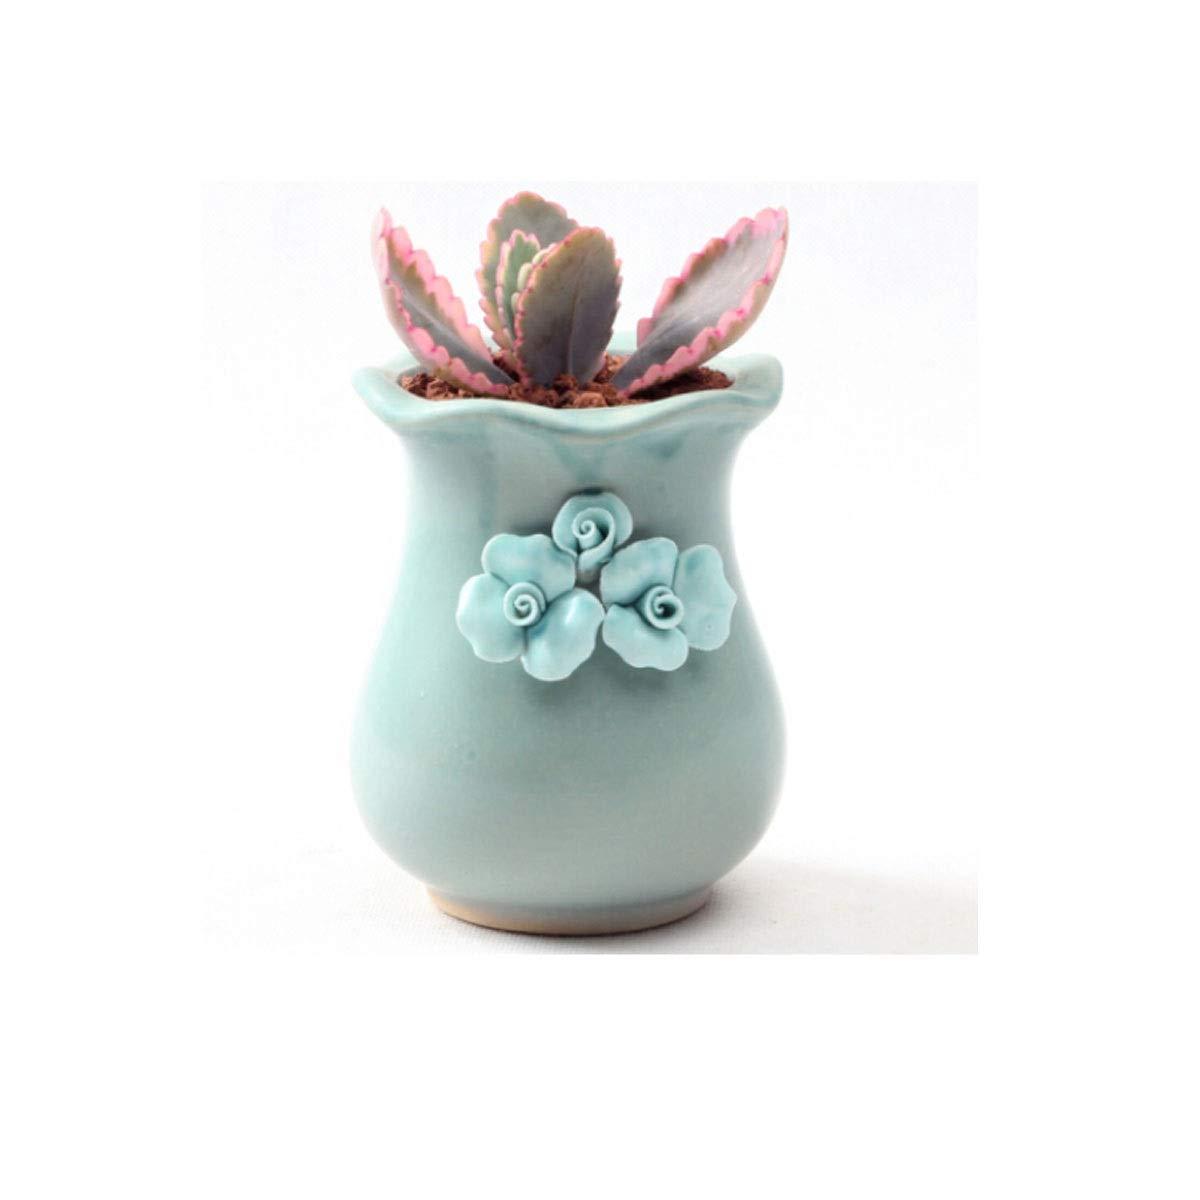 HUIJUNWENTI Gardening Three Flower Gourd Flower Pots, Ceramic Nordic Vases, Indoor Living Room Creative Small Flower Pots, (Color : Z) by HUIJUNWENTI